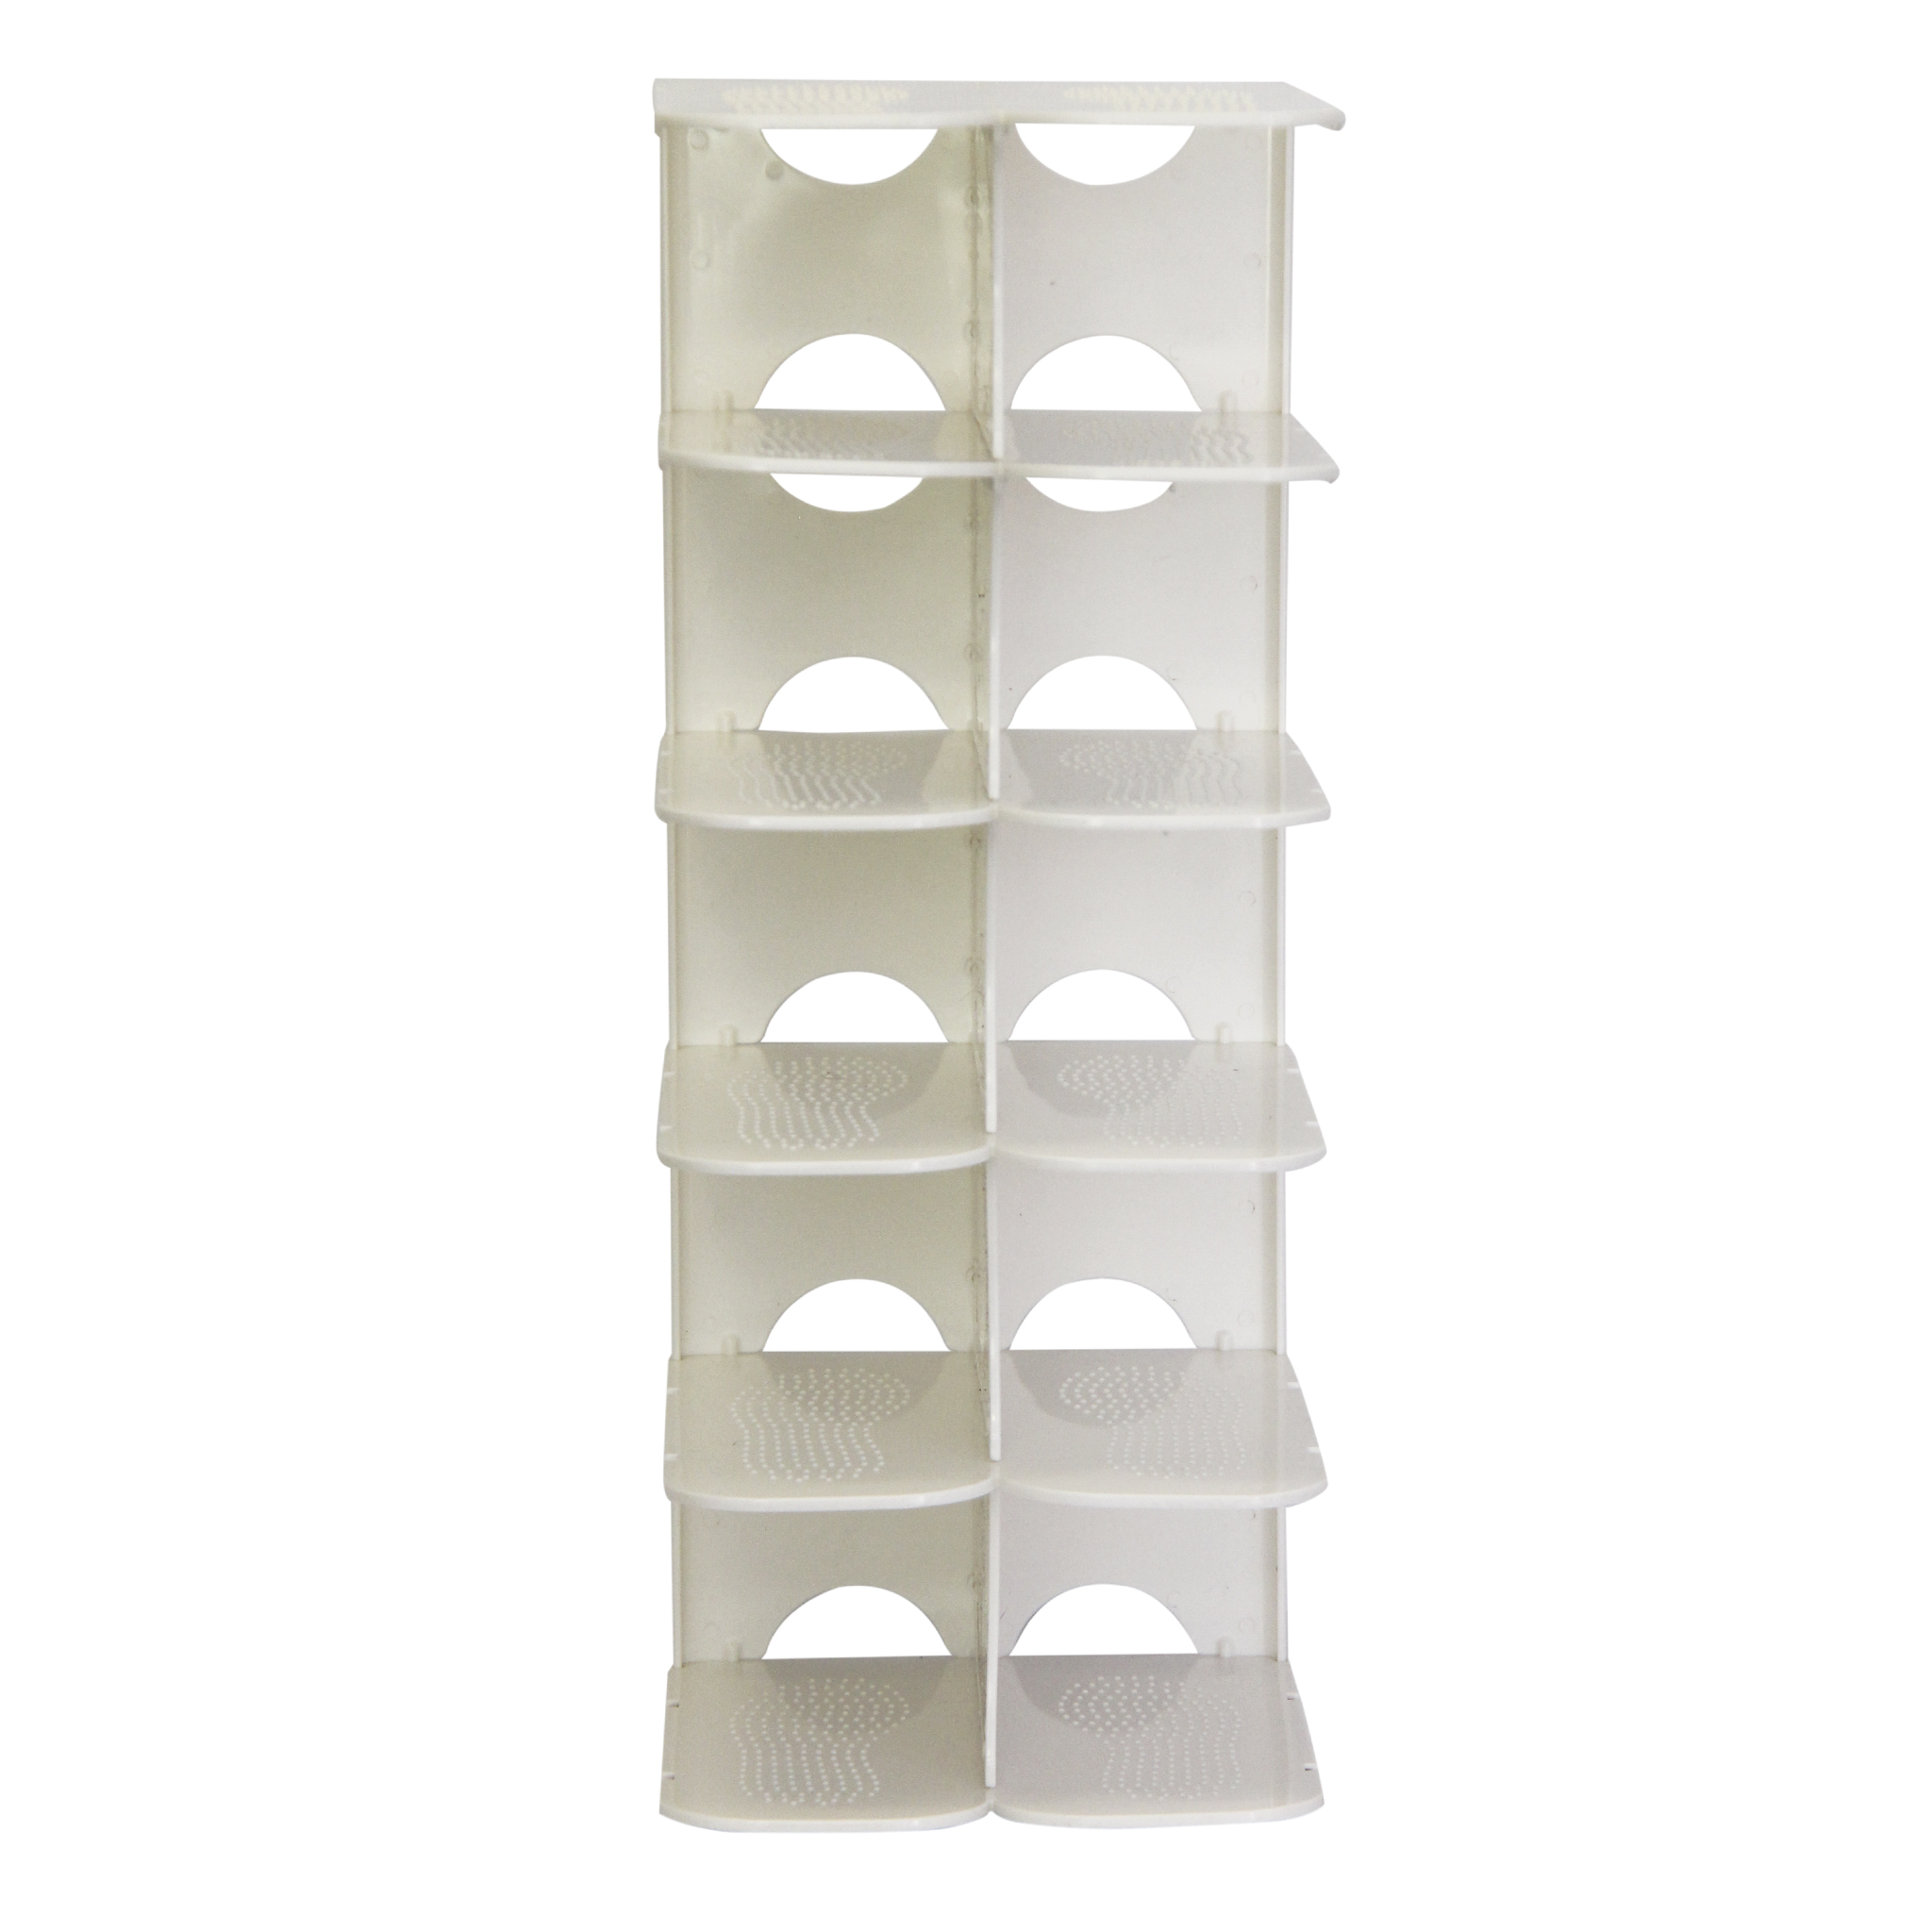 Pillar 6 Layer Shoe Rack - White